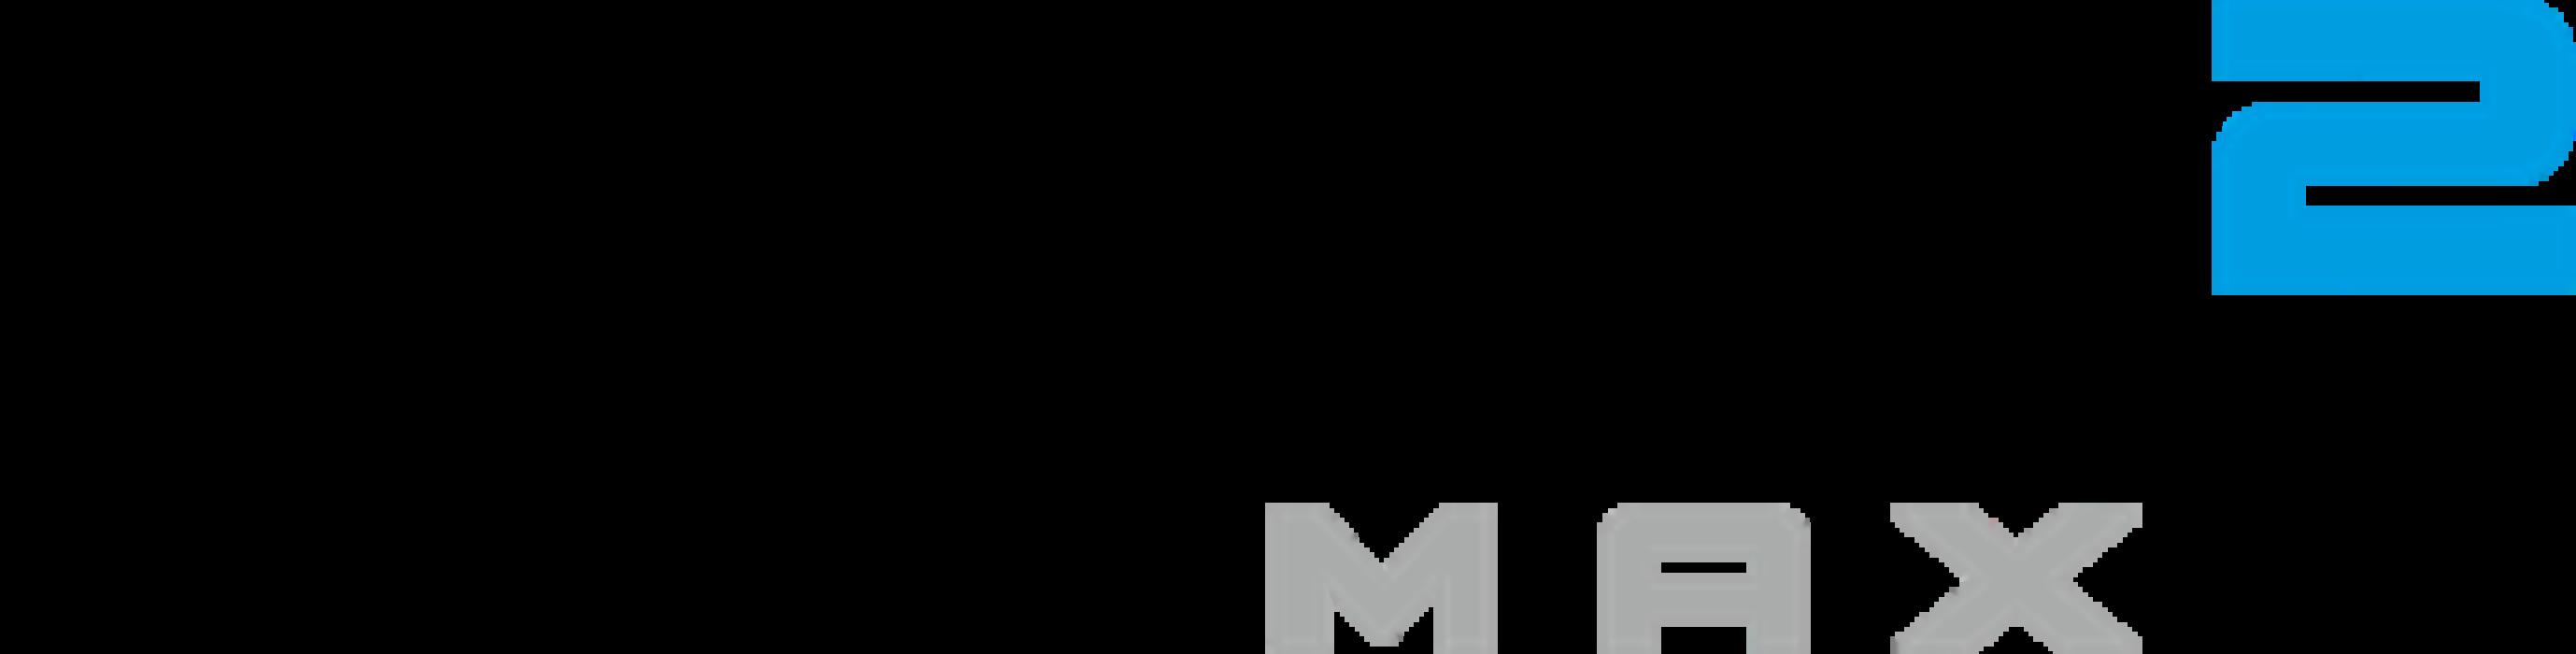 SIM2 MAX Logo Wht alt